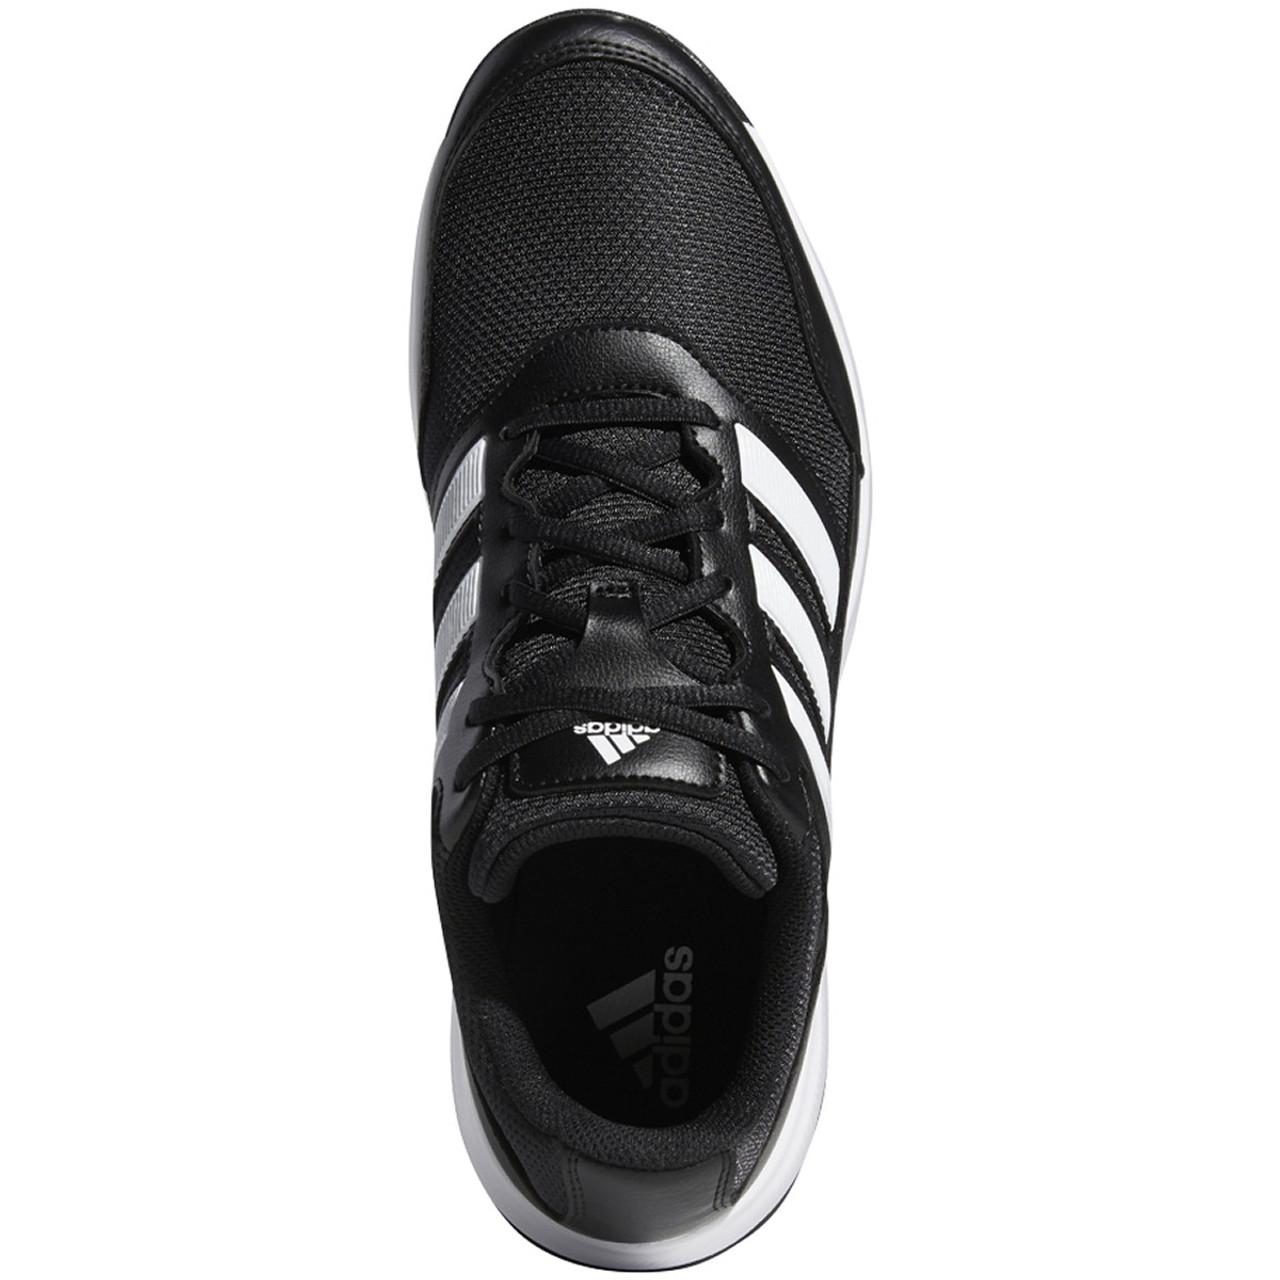 Adidas Tech Response 2.0 Golf Shoes - Black / White / Black